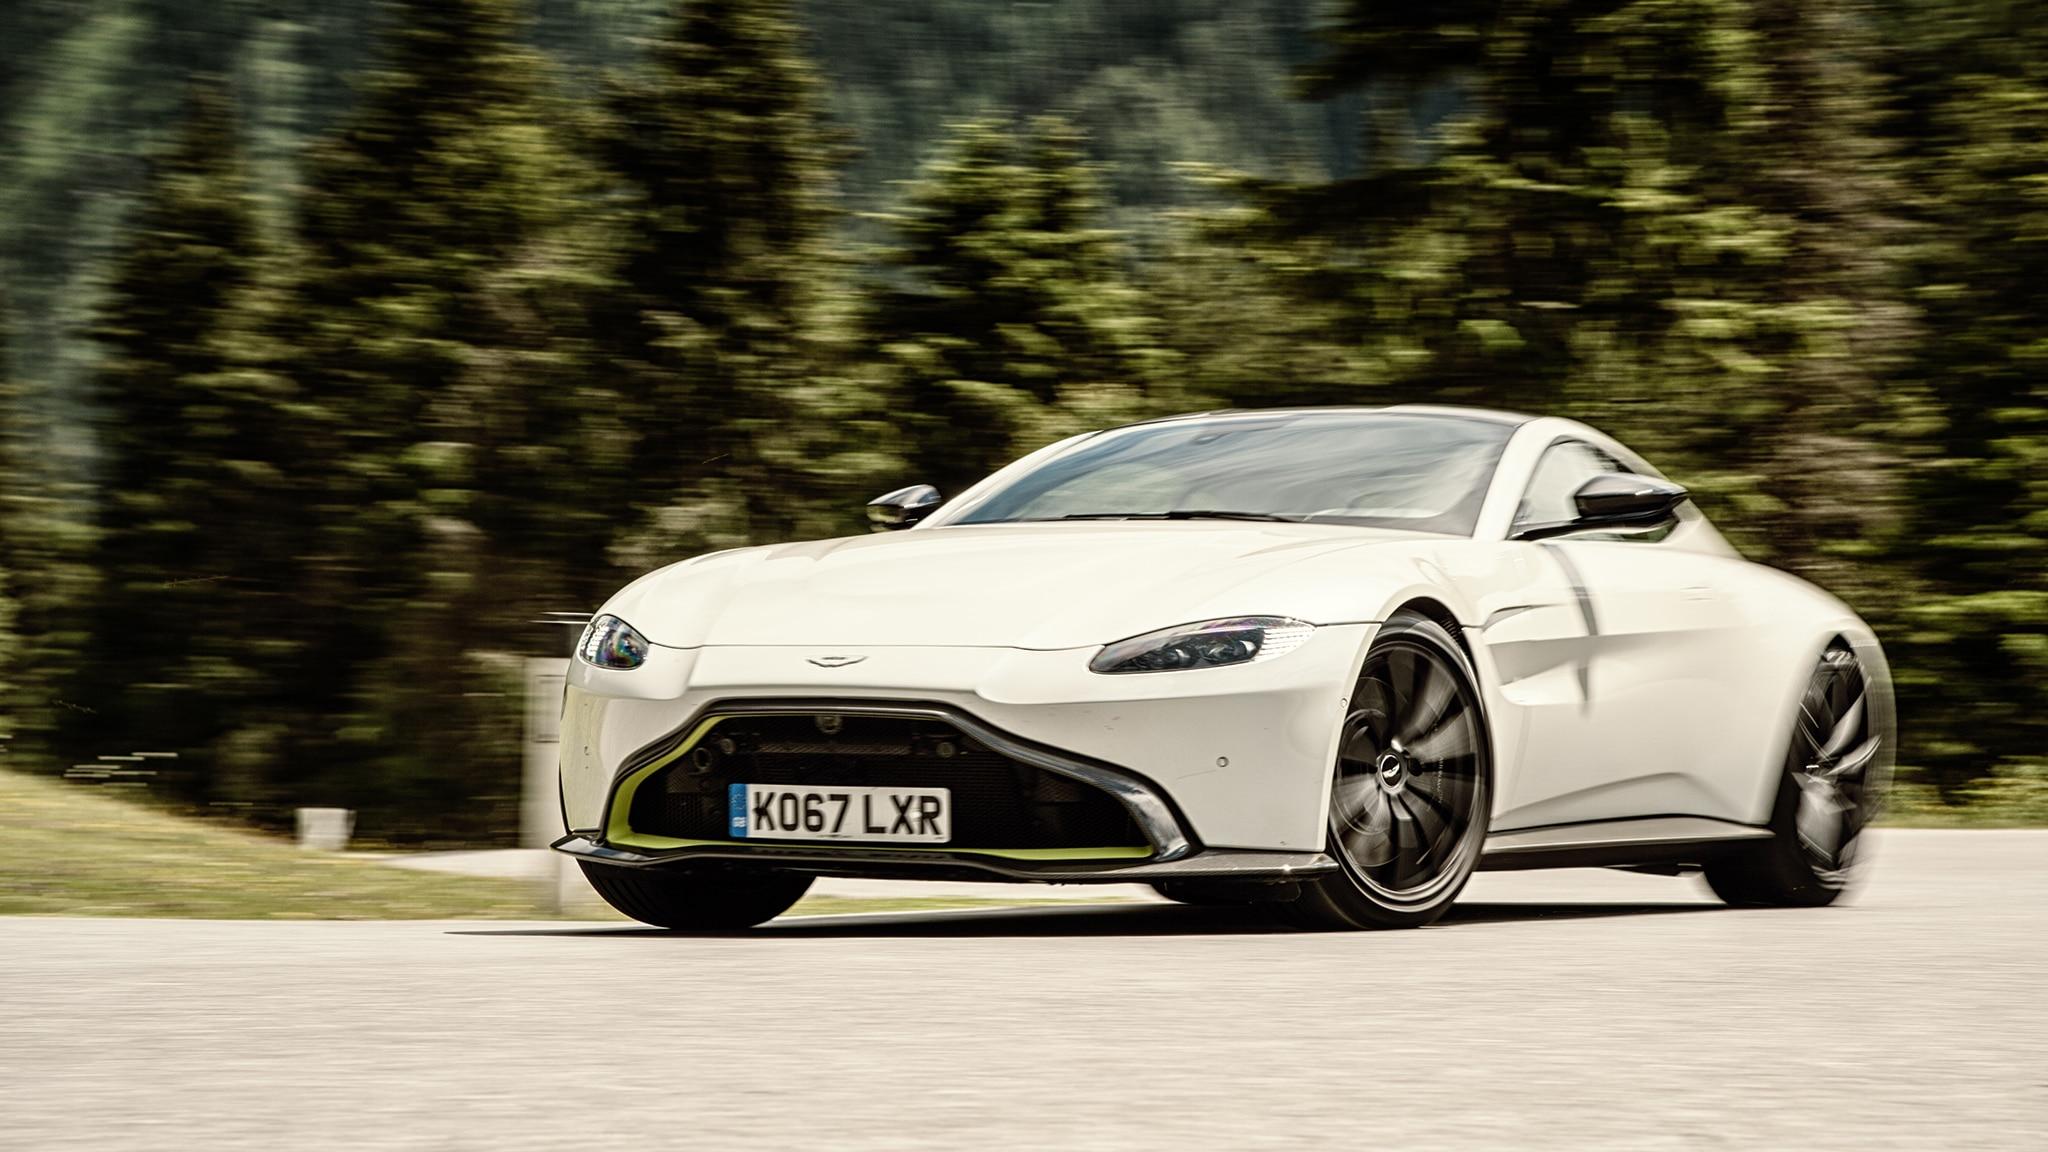 2019 Aston Martin Vantage vs  Mercedes-AMG GT C, Porsche 911